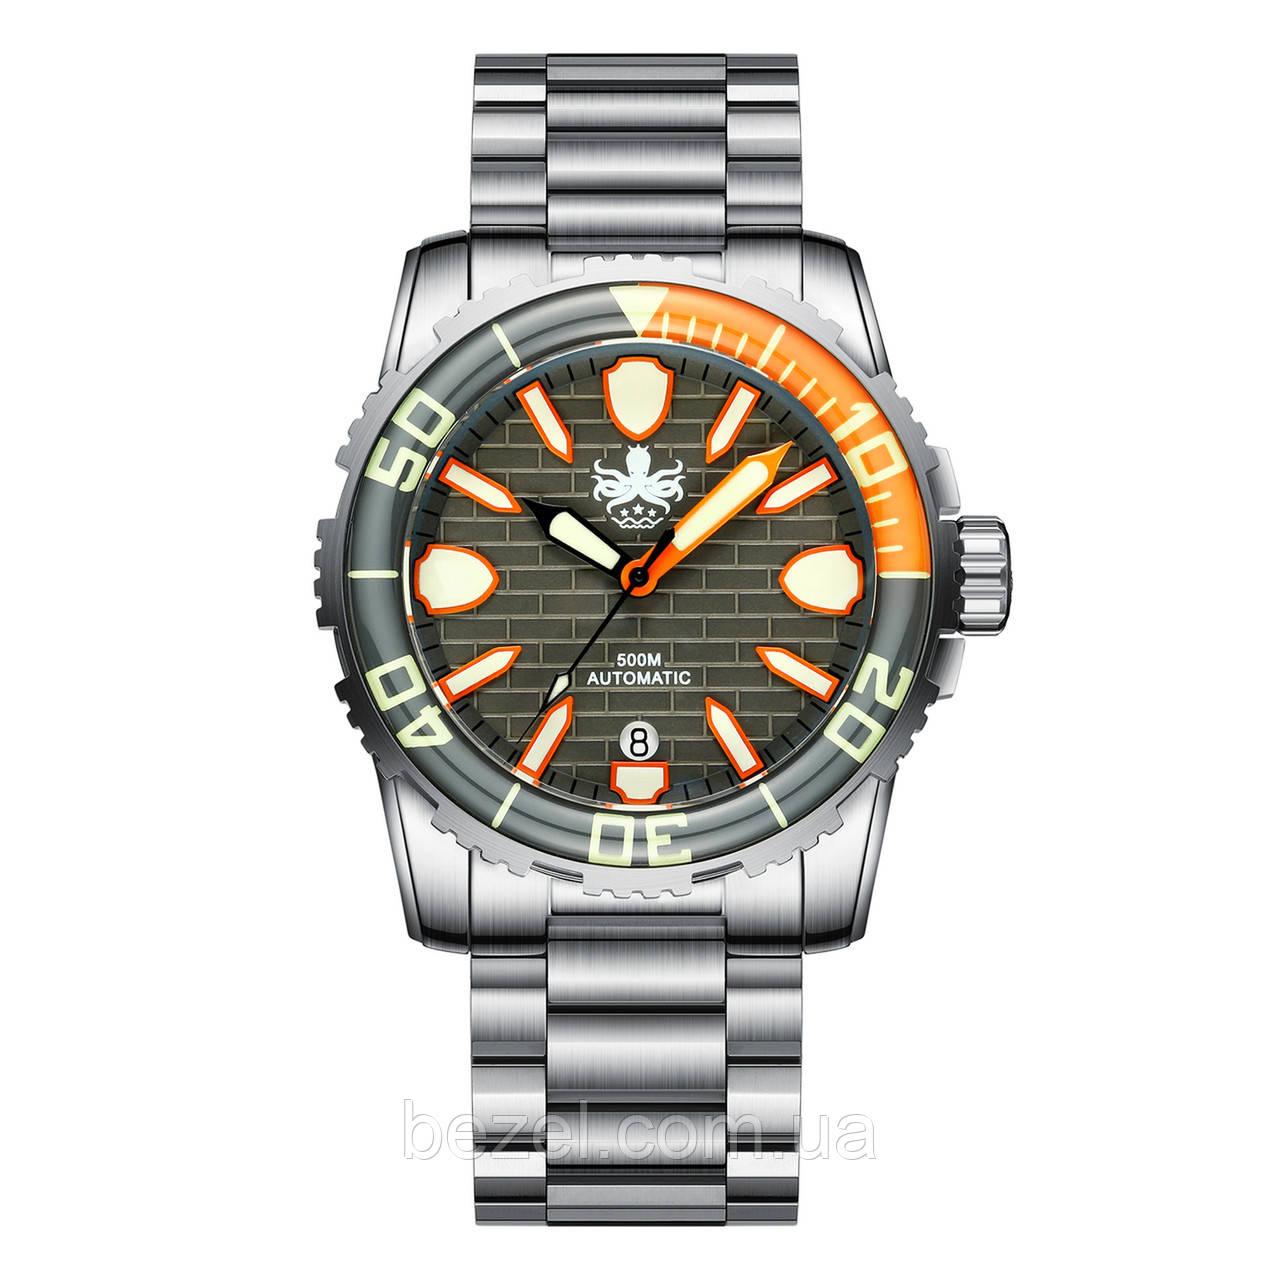 Чоловічі годинники PHOIBOS GREAT WALL 500M Automatic Diver PY022D Grey-Orange Limited Edition